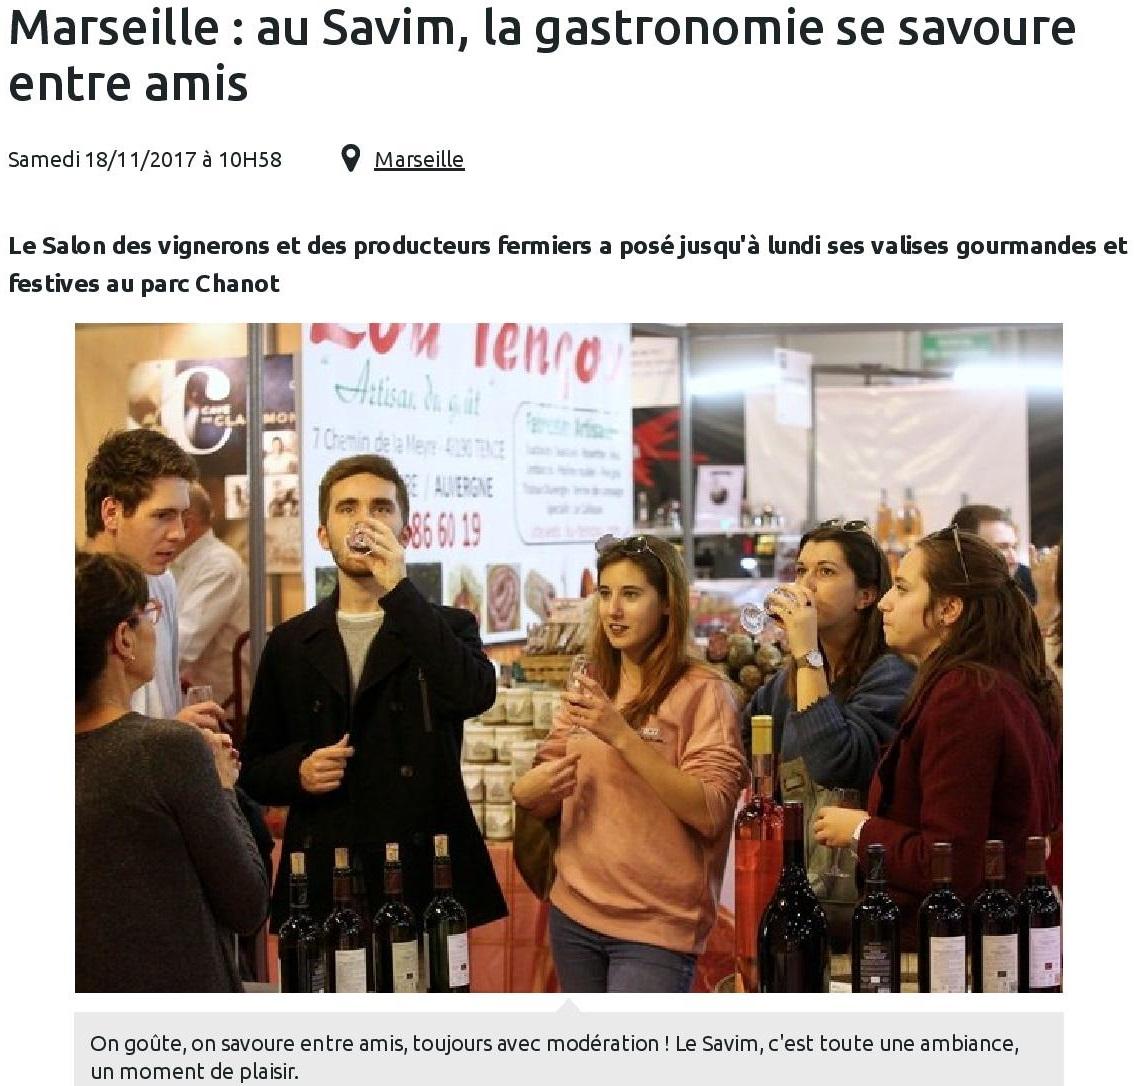 Marseille : au Savim, la gastronomie se savoure entre amis